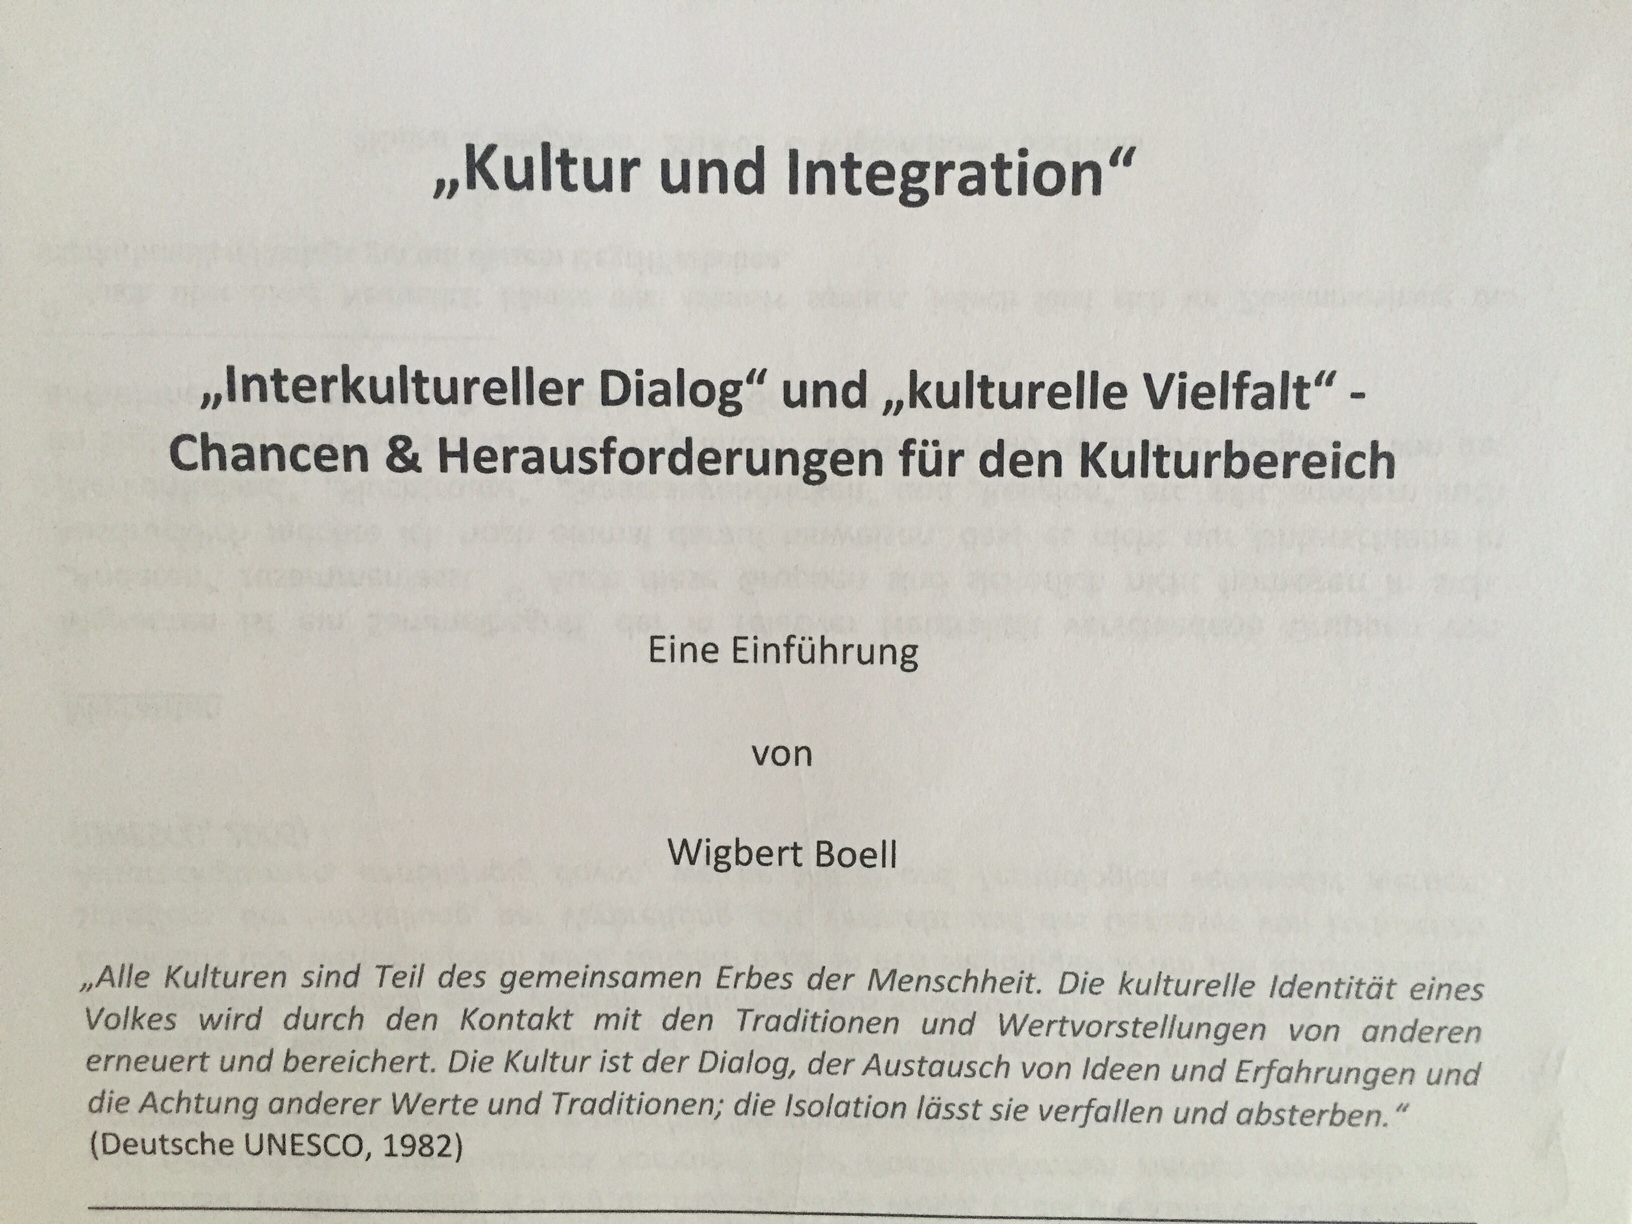 Kultur & Integration - von Wigbert Boell